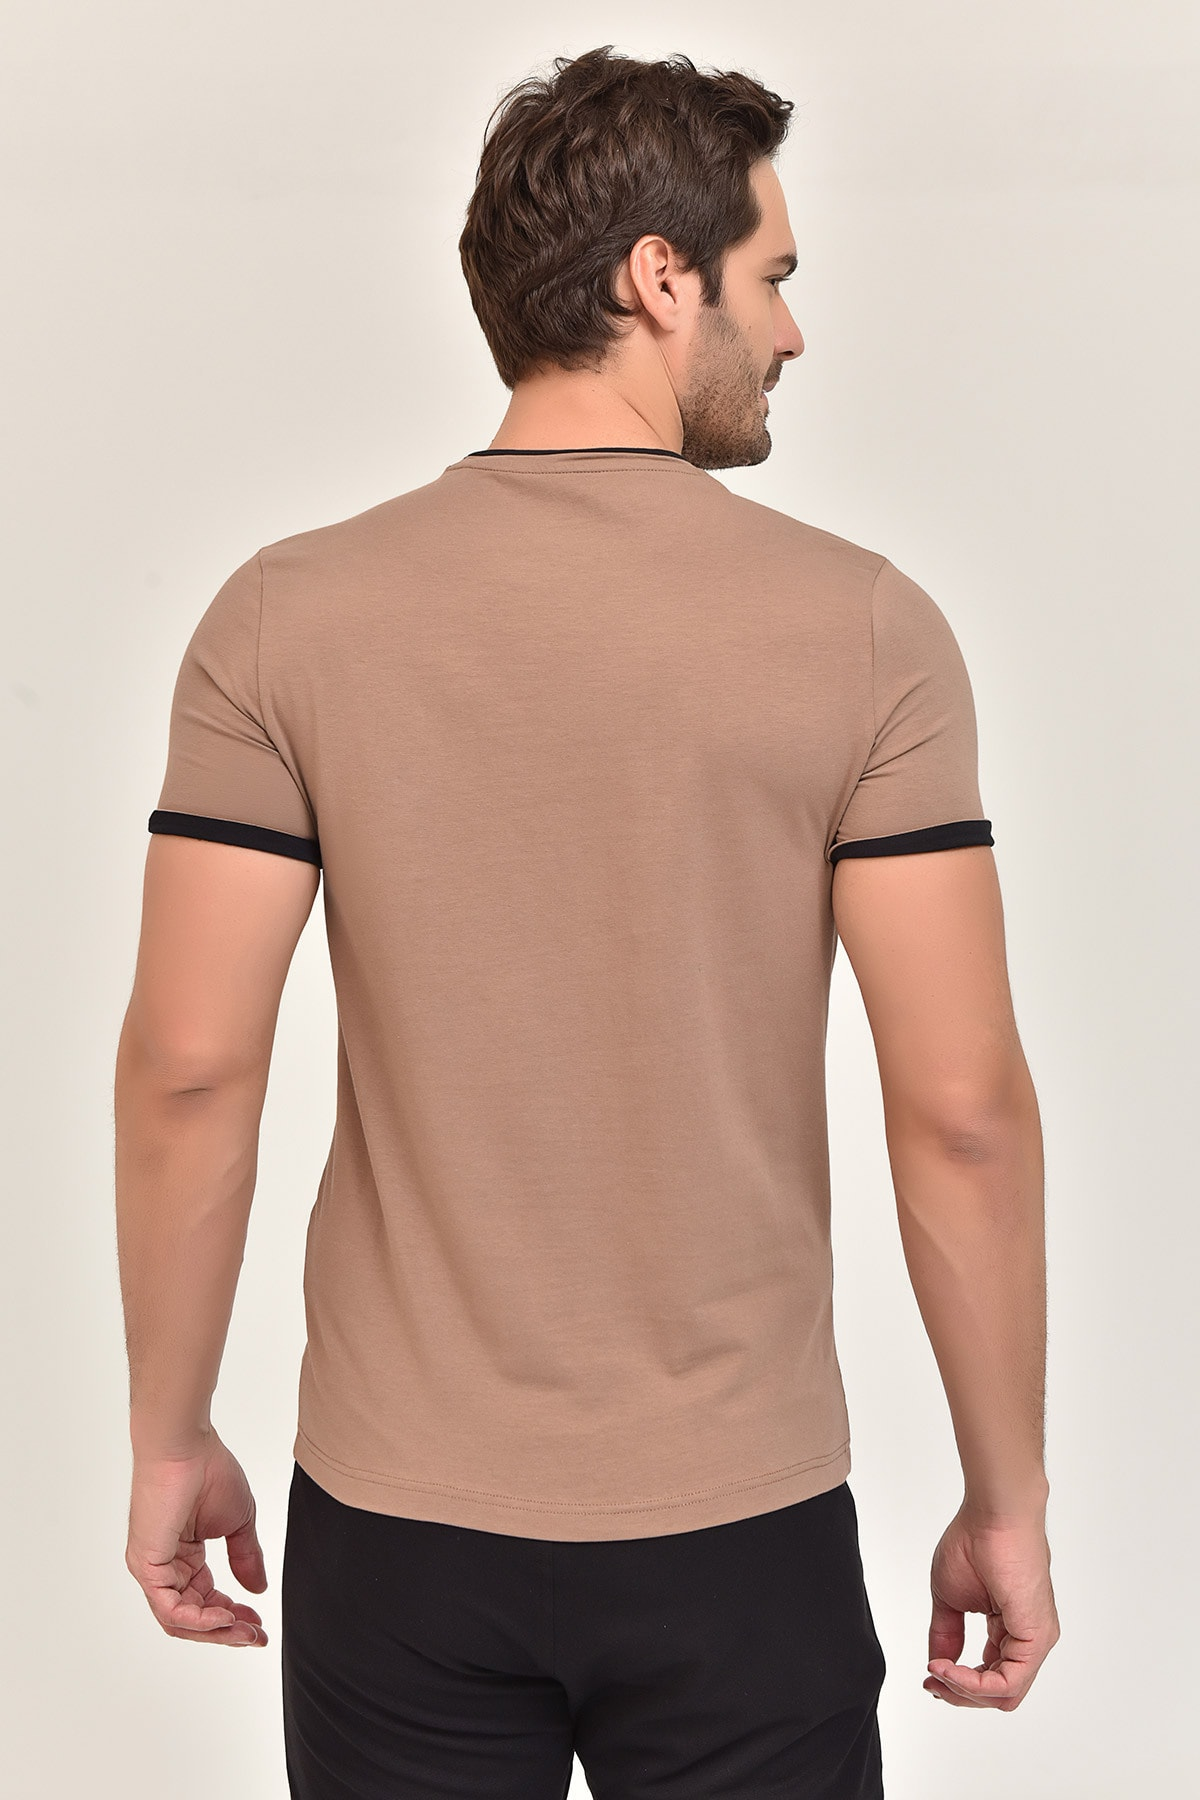 bilcee Kahverengi Pamuklu Erkek T-Shirt ES-2374 2